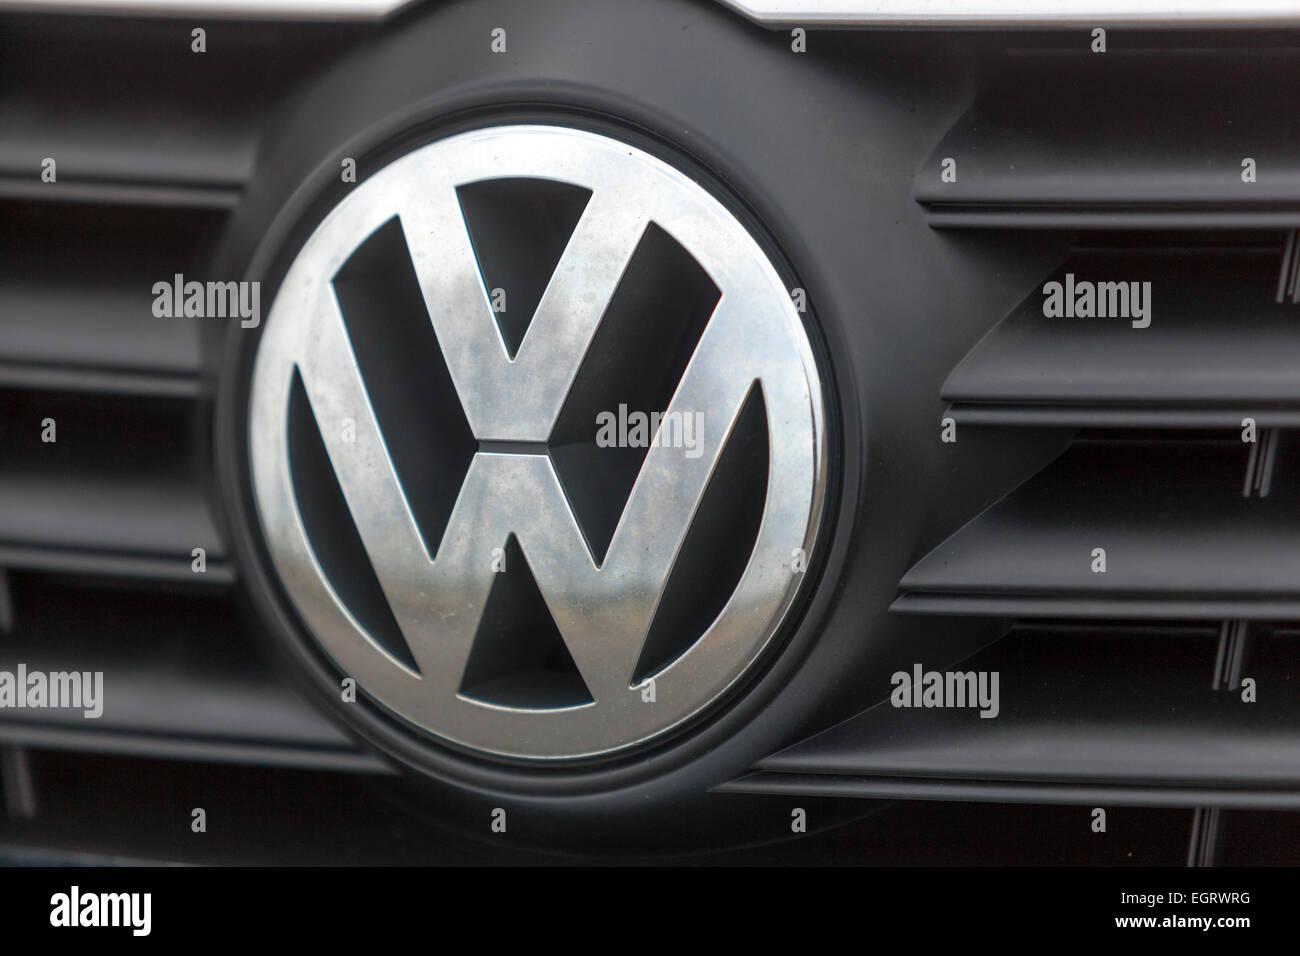 Volkswagen VW car logo sign - Stock Image